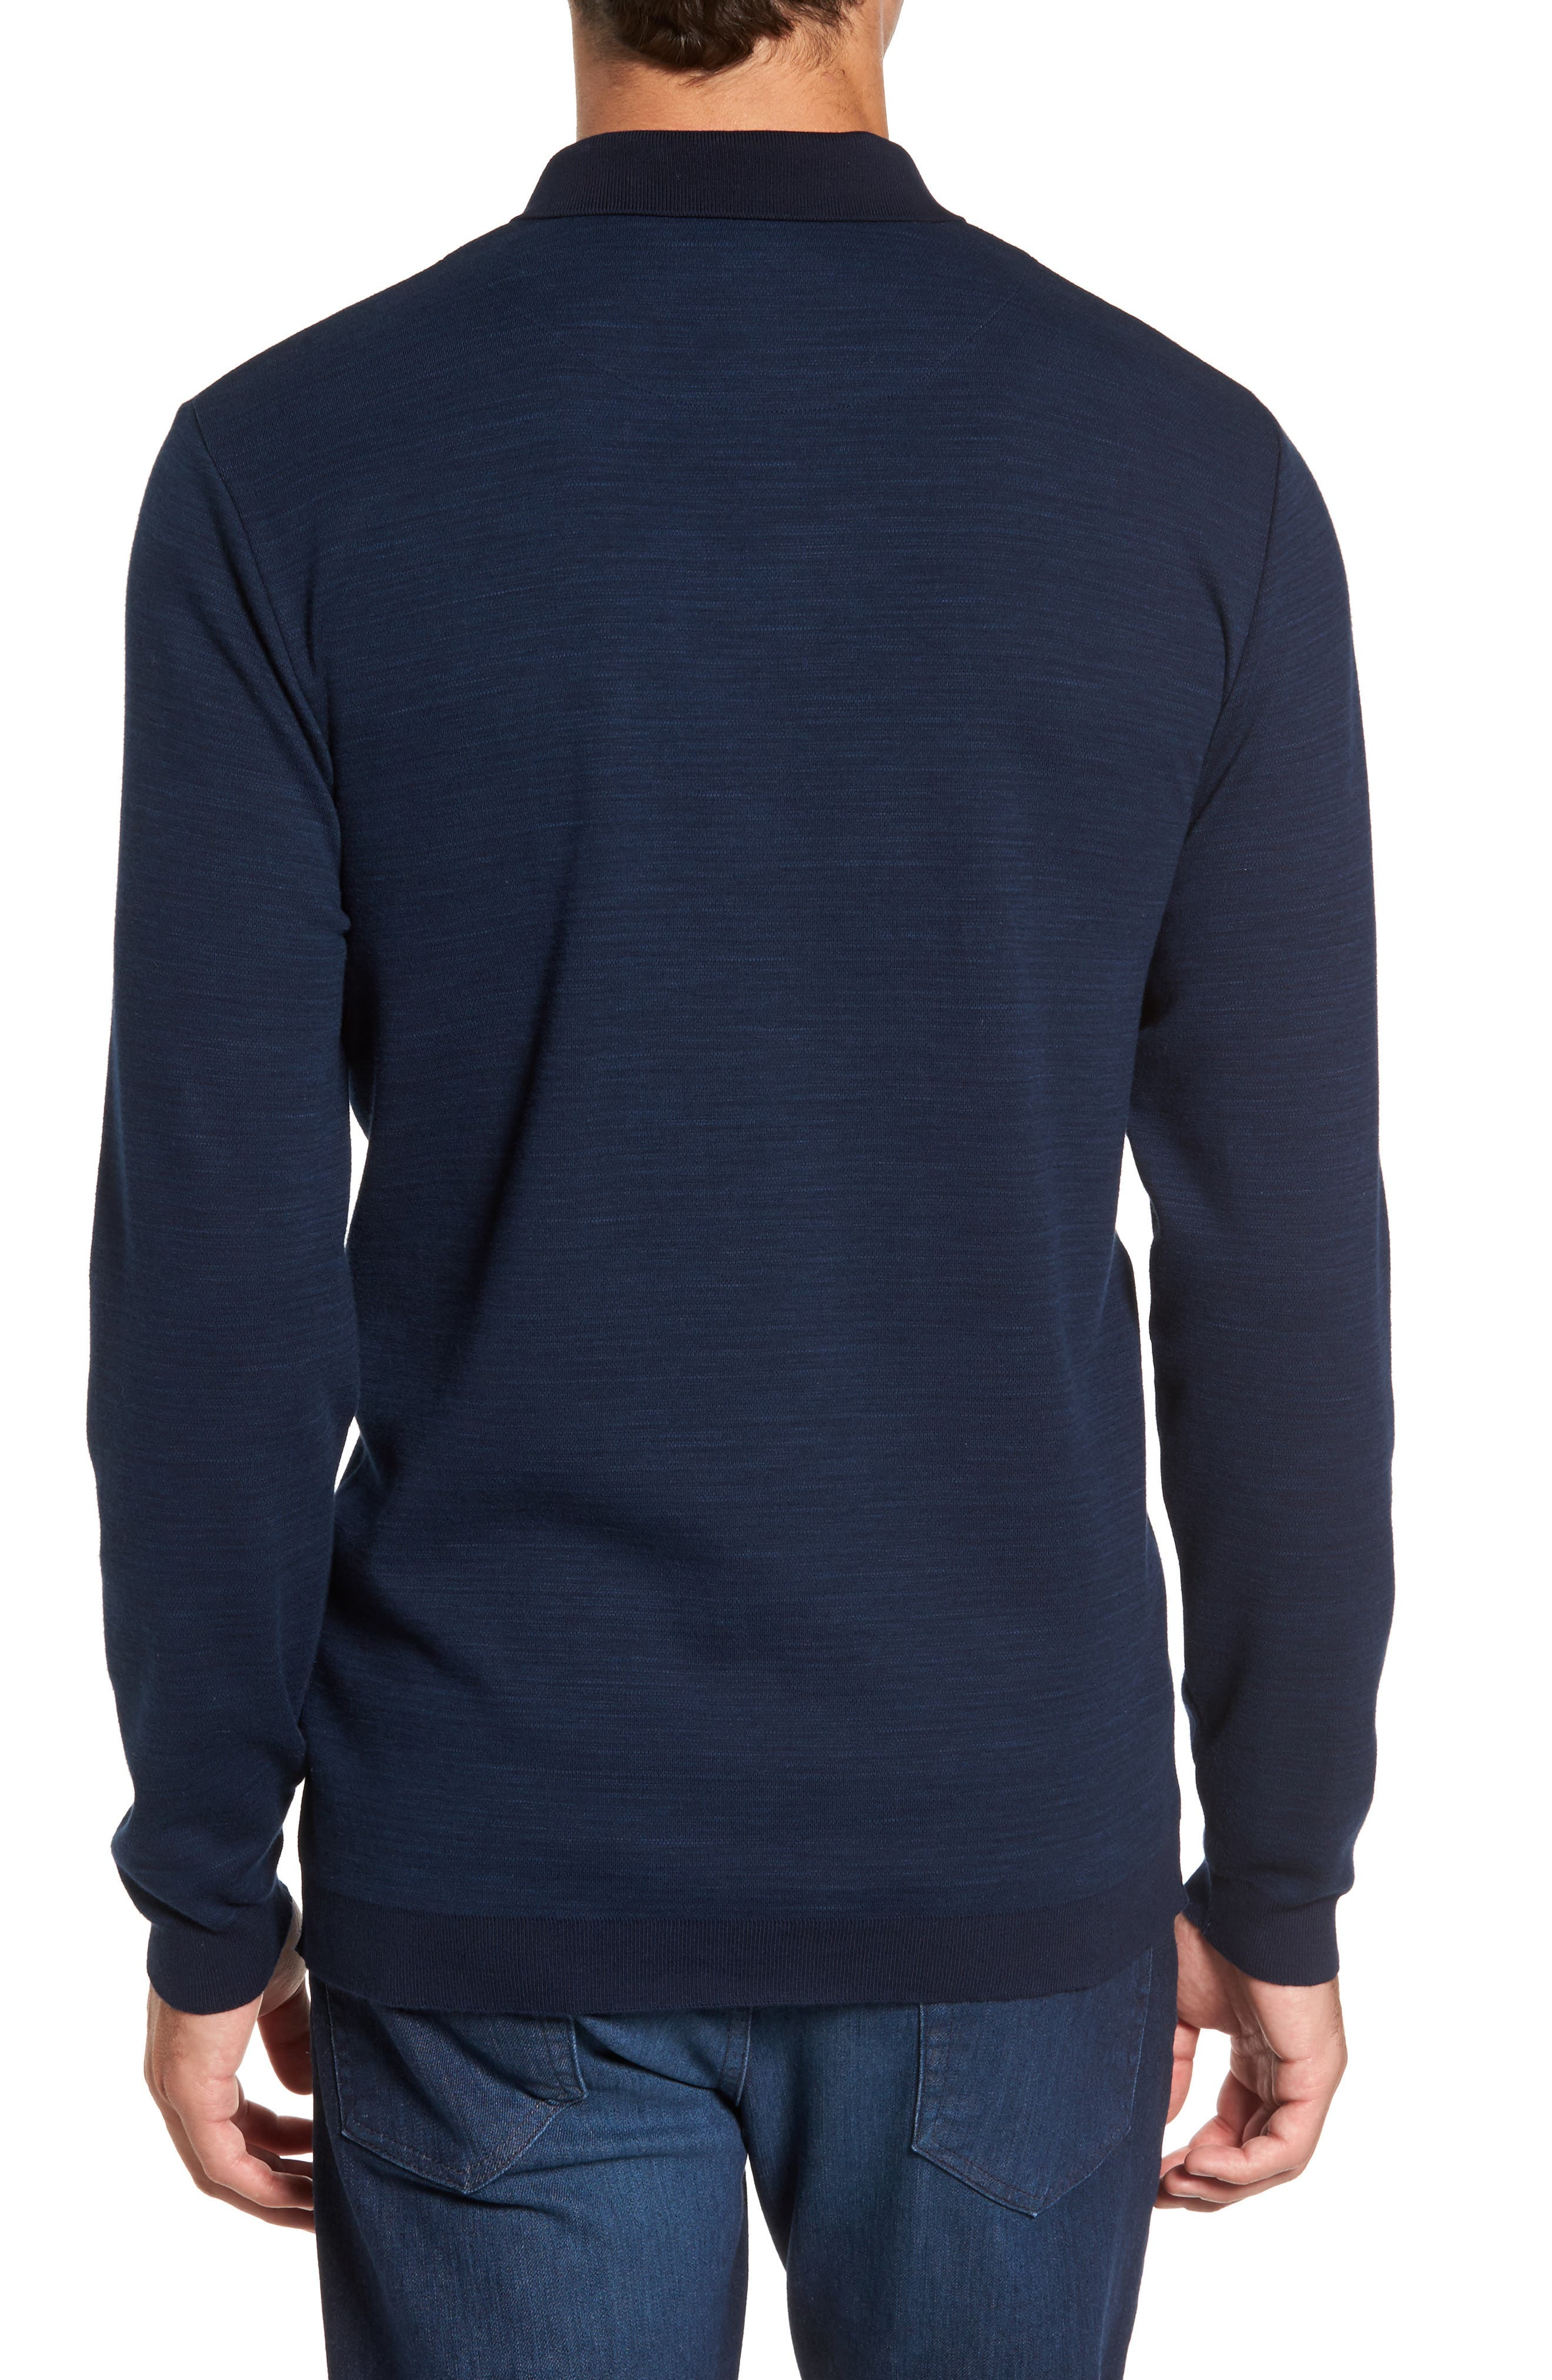 Shelton Cotton Sweater,                             Alternate thumbnail 2, color,                             Ocean